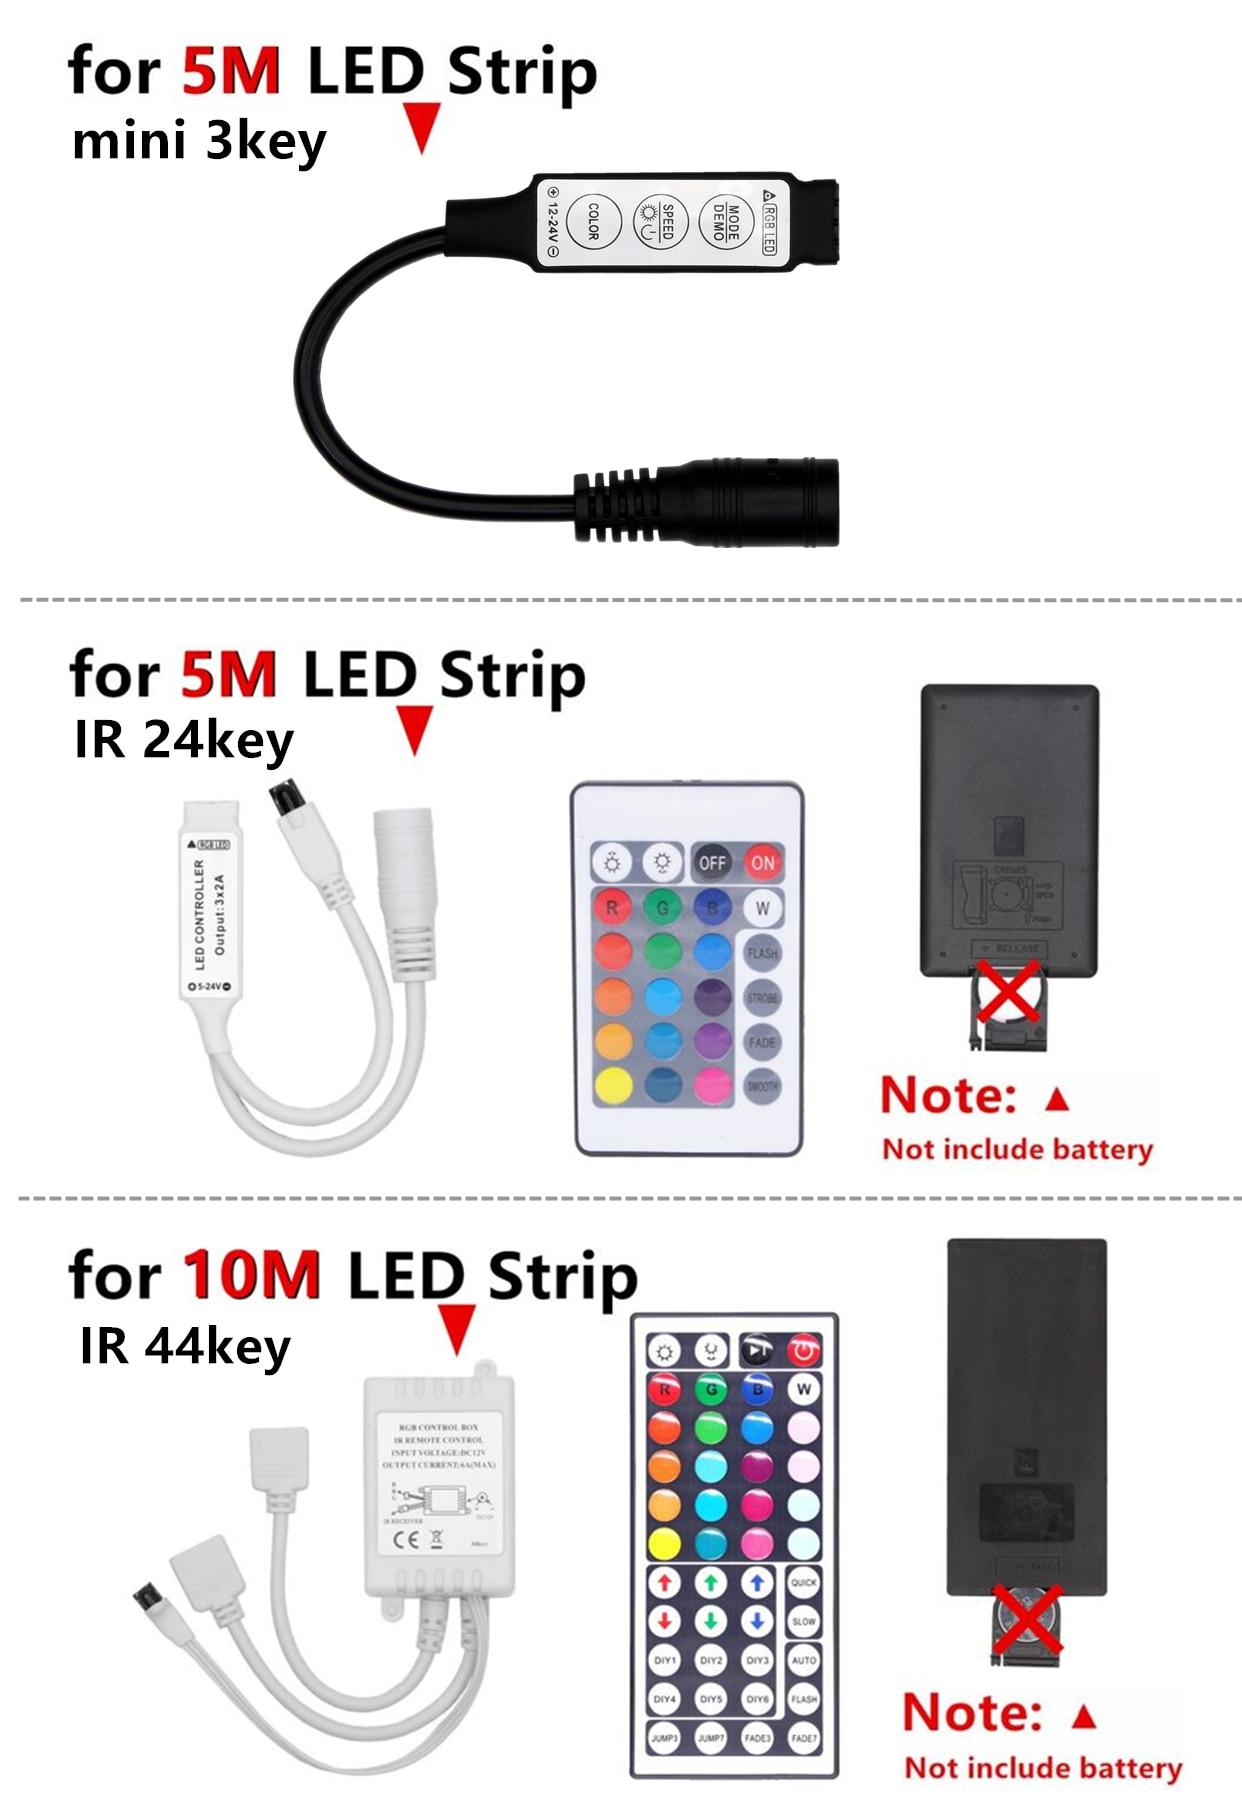 H58d01777982d449f9b4d3d19b6a075a0D RGB LED Strip Waterproof 2835 5M 10M DC12V Fita LED Light Strip Neon LED 12V Flexible Tape Ledstrip With Controller and Adapter